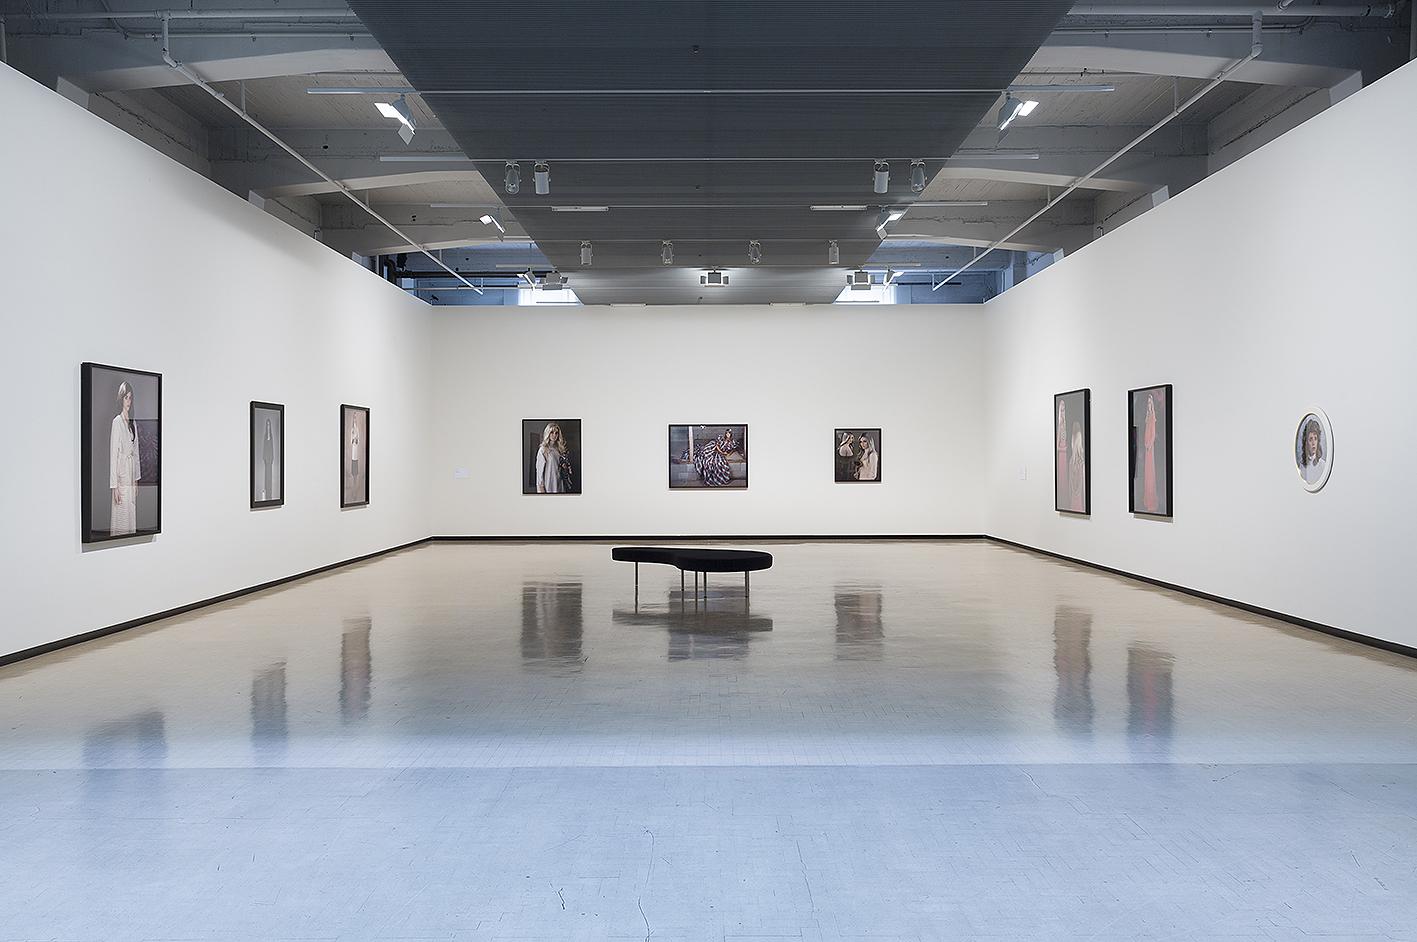 City Gallery_Yvonne Todd_Creamy Psychology_documentation_hiRez_018.jpg